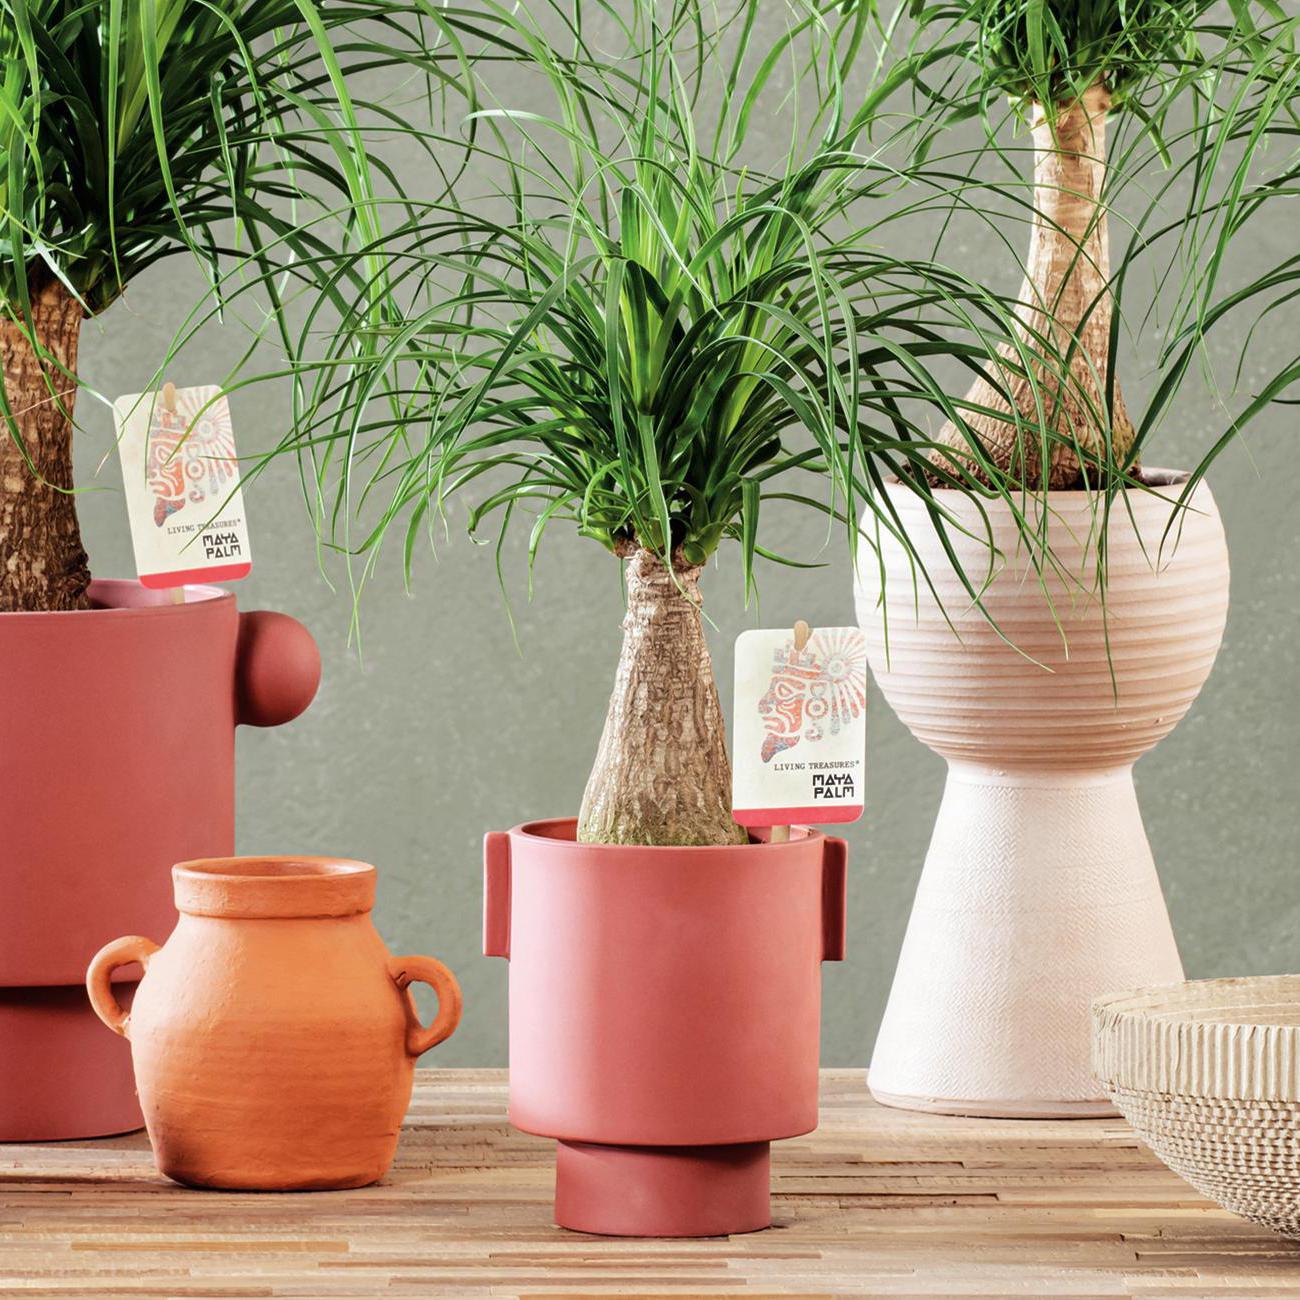 floramedia-custers-plants-living-treasures-portfolio-overzichtspagina